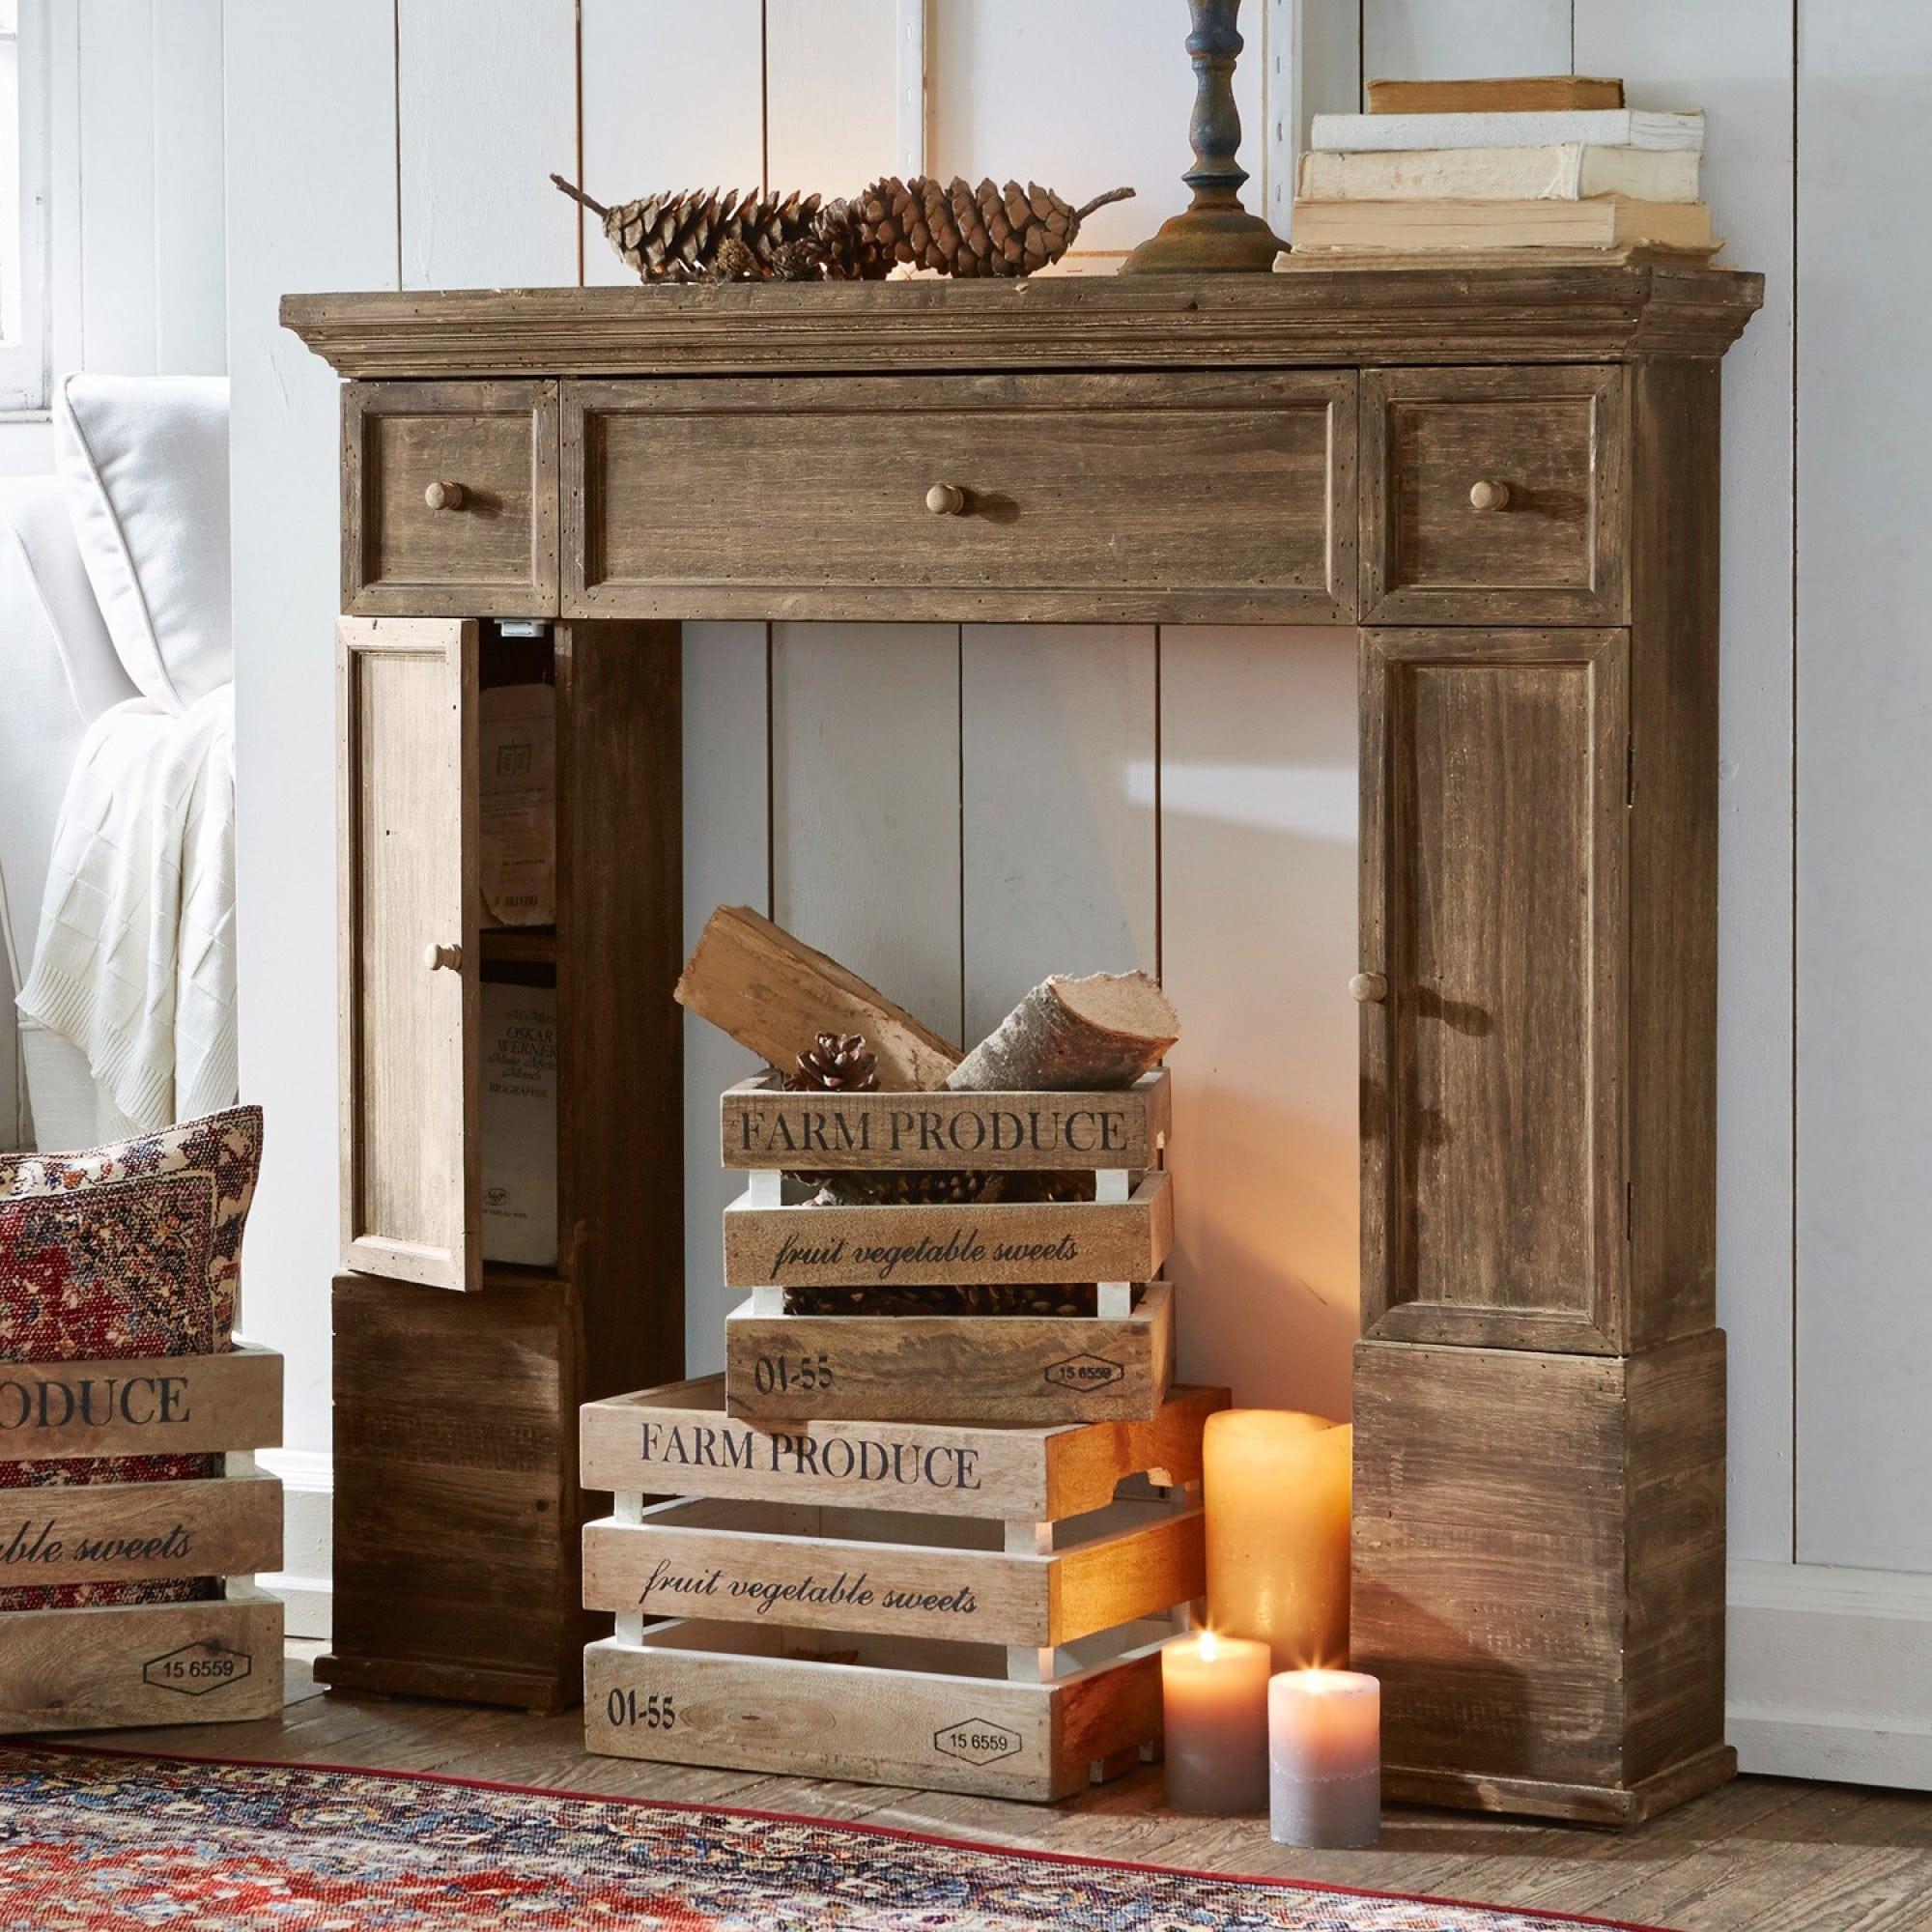 kaminkonsole konterra loberon coming home. Black Bedroom Furniture Sets. Home Design Ideas